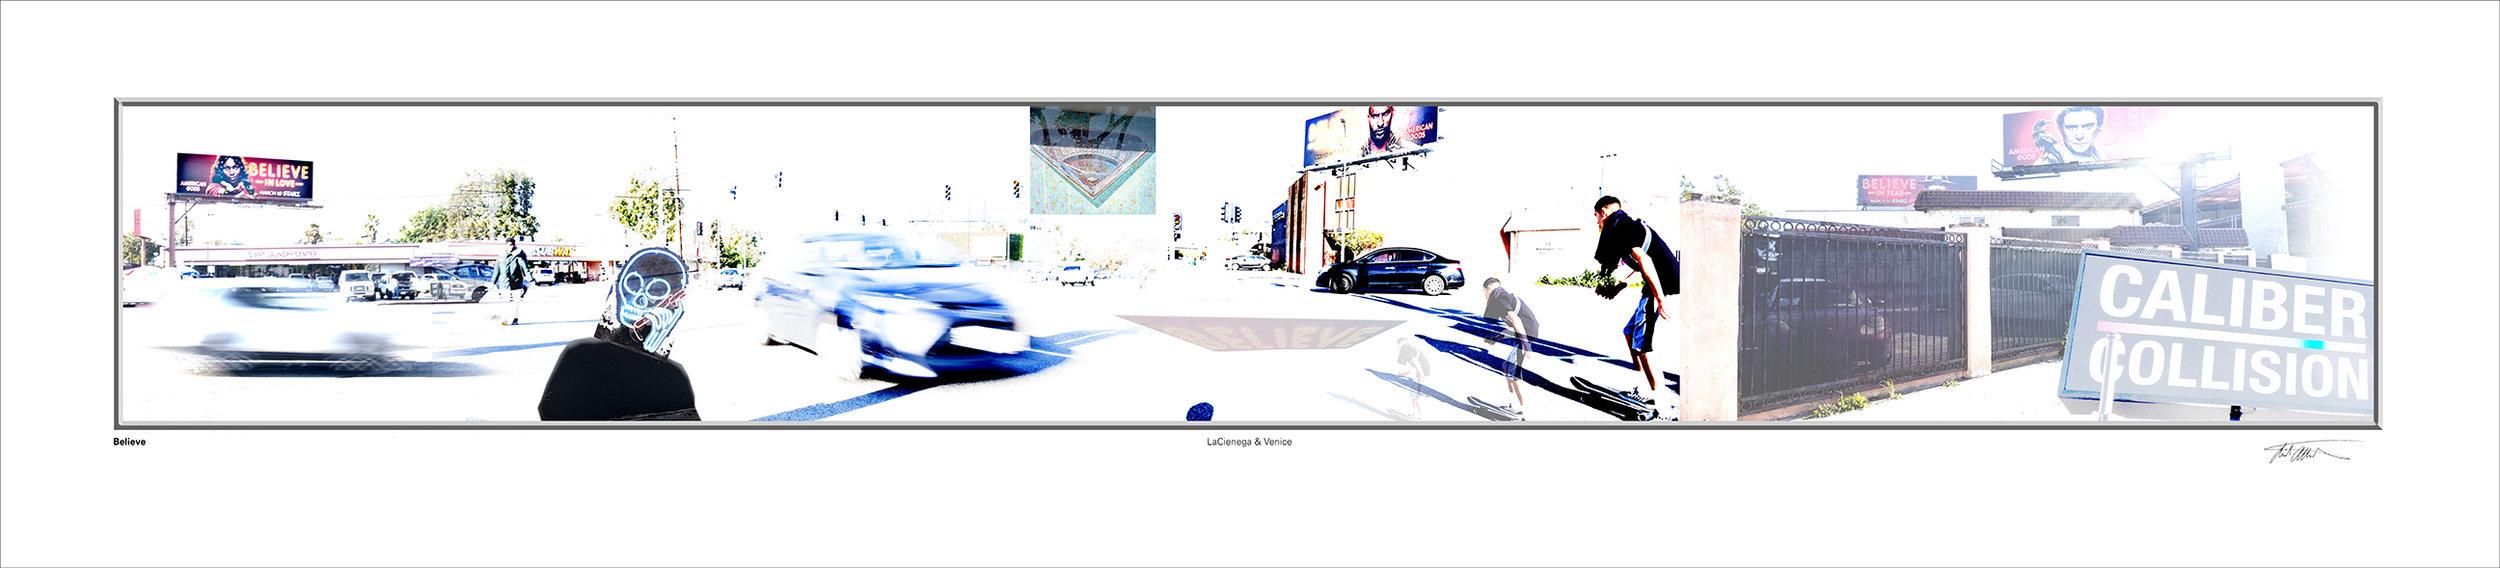 "Believe ;  Venice Blvd./La Cienega Blvd. 66"" x 15"""